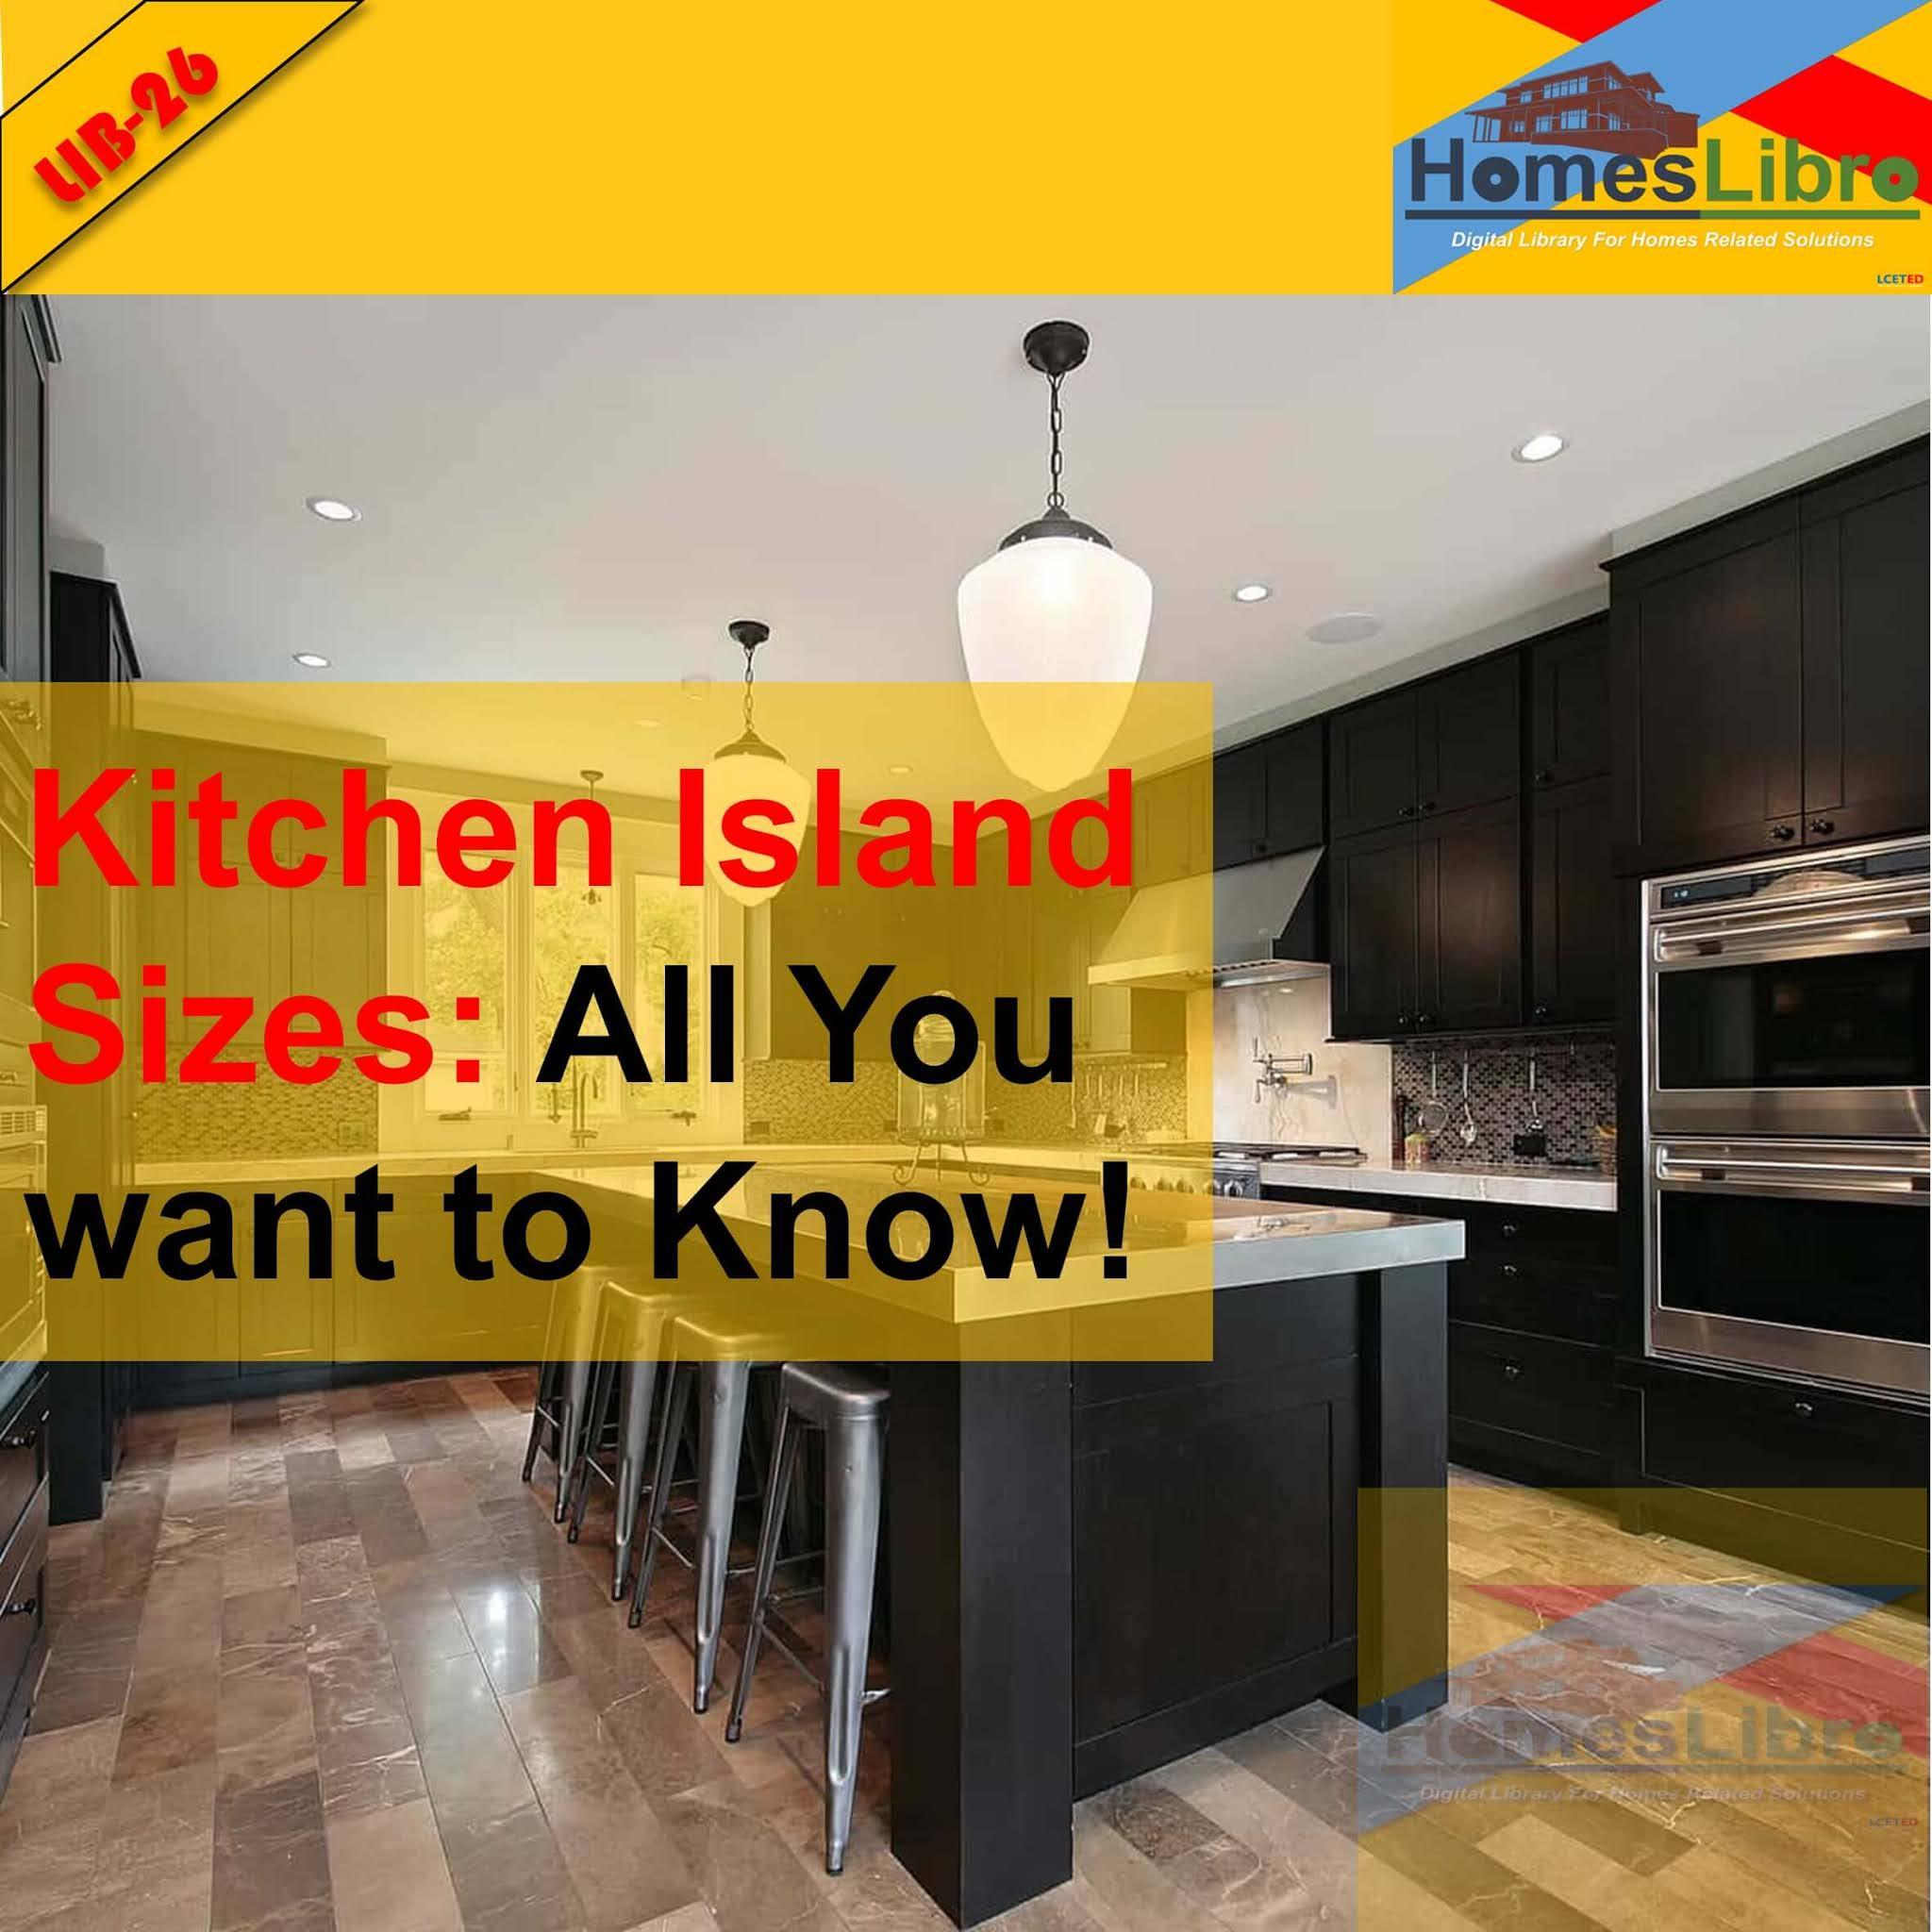 Kitchen Island Sizes